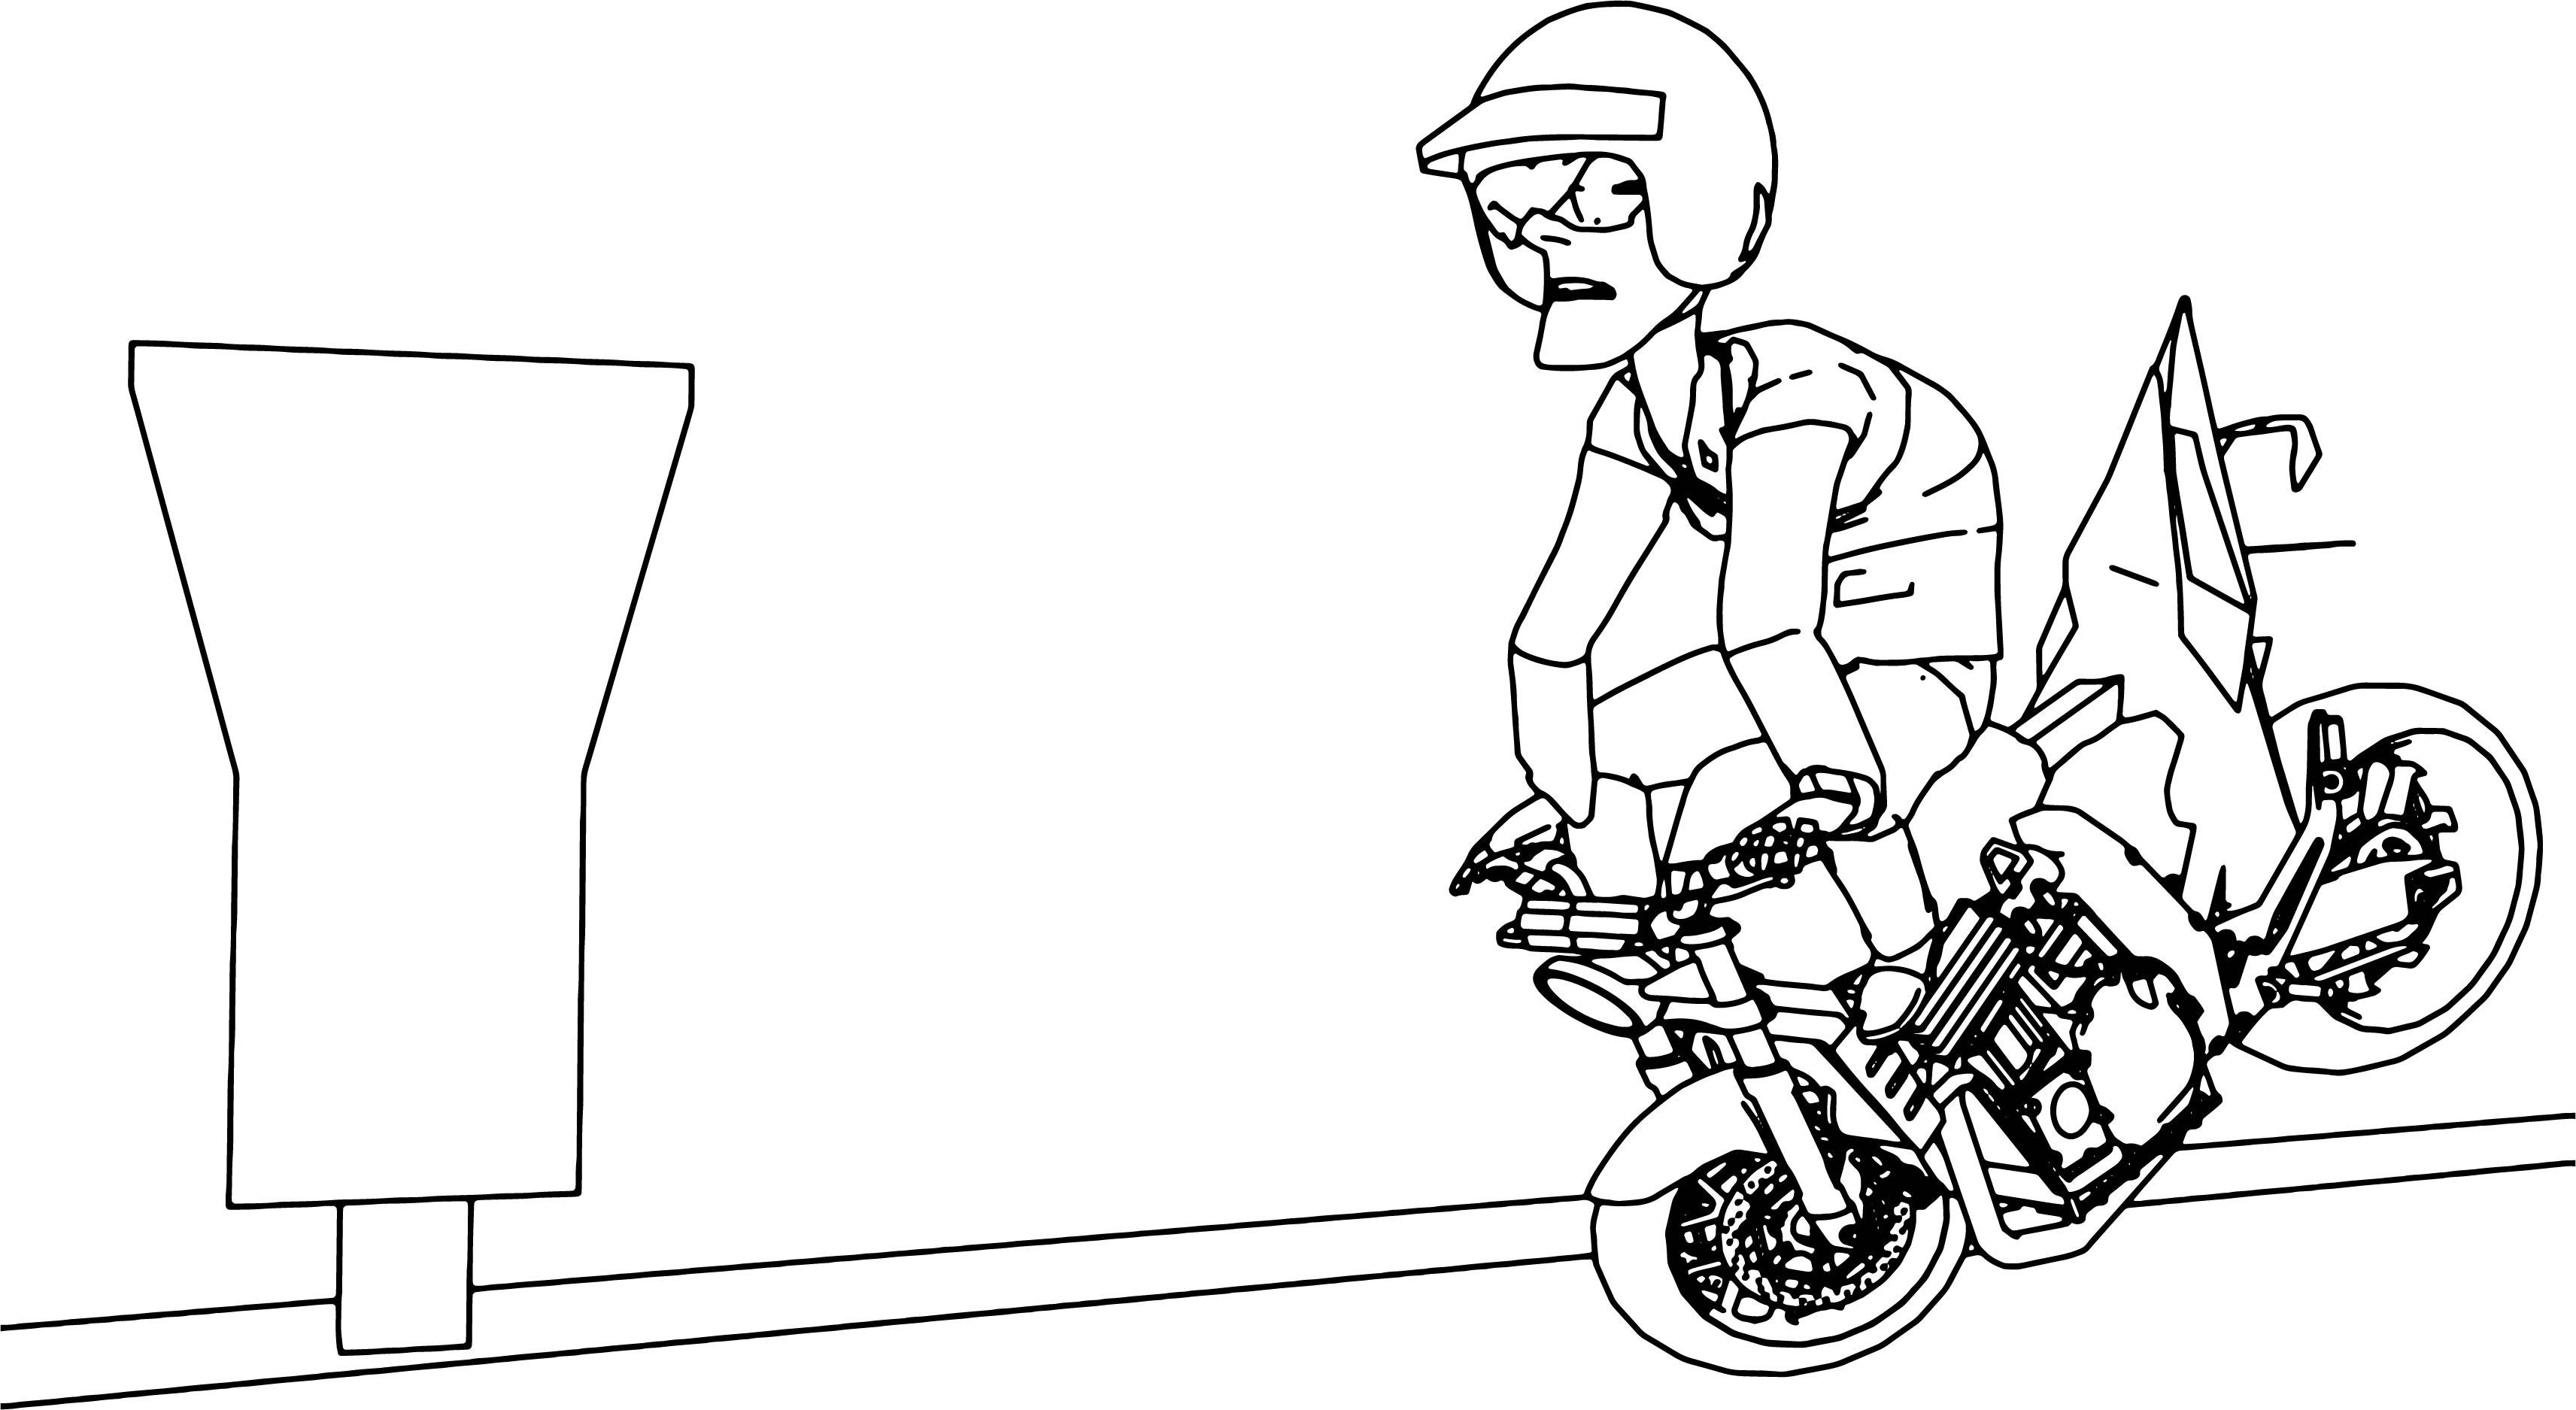 Car Crash Coloring Pages : Coloring car accident sketch page